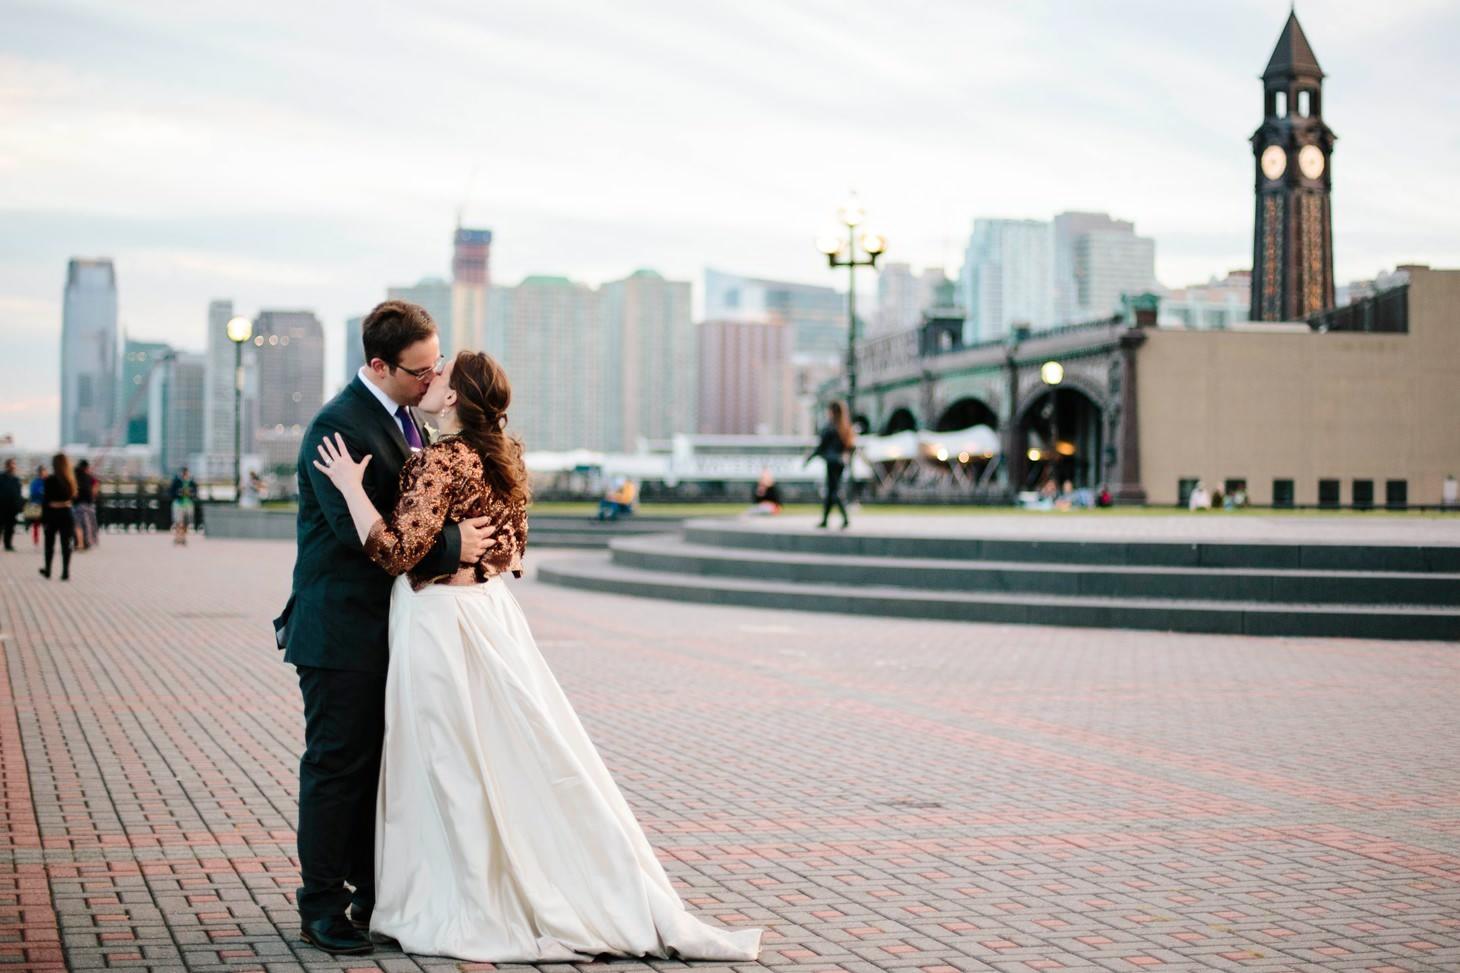 042-nyc-wedding-photographer-hoboken-waterfront-wedding-photos-smitten-chickens.jpg